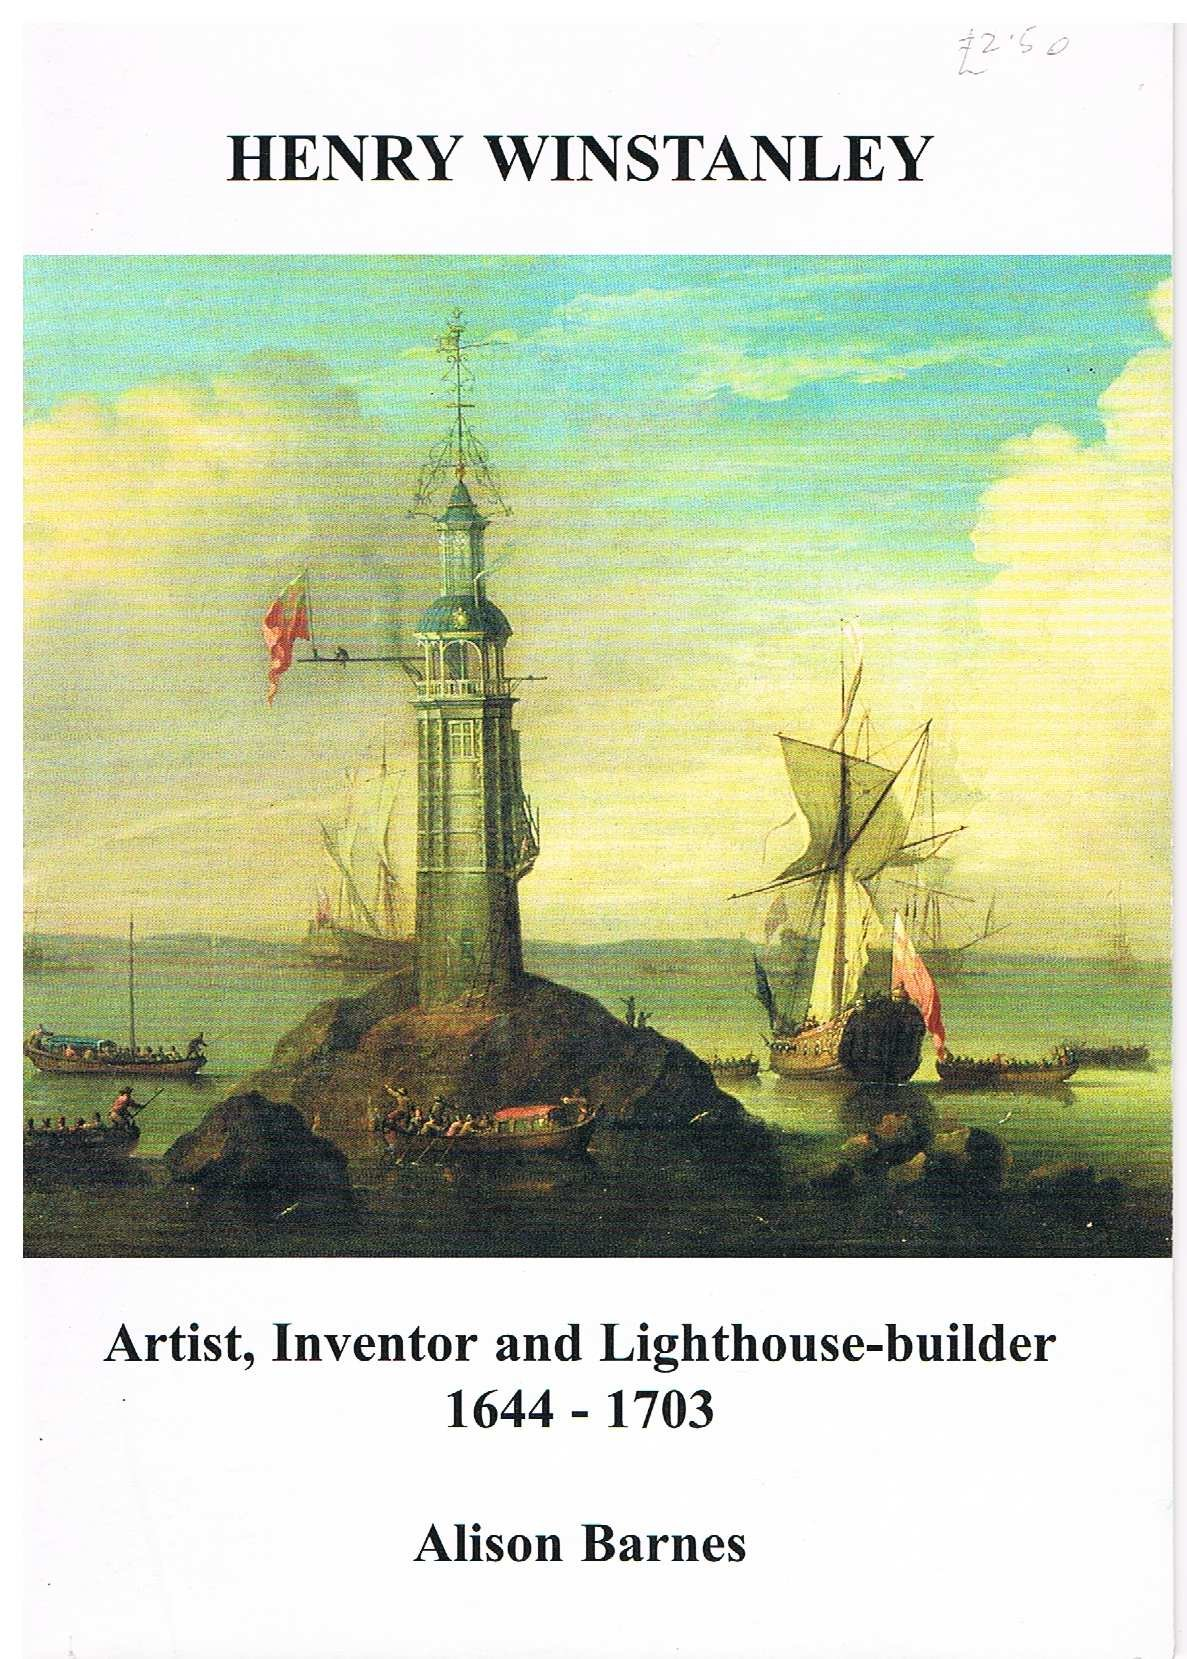 Henry Winstanley Artist, Inventor and Lighthouse-builder 1644-1703 PDF